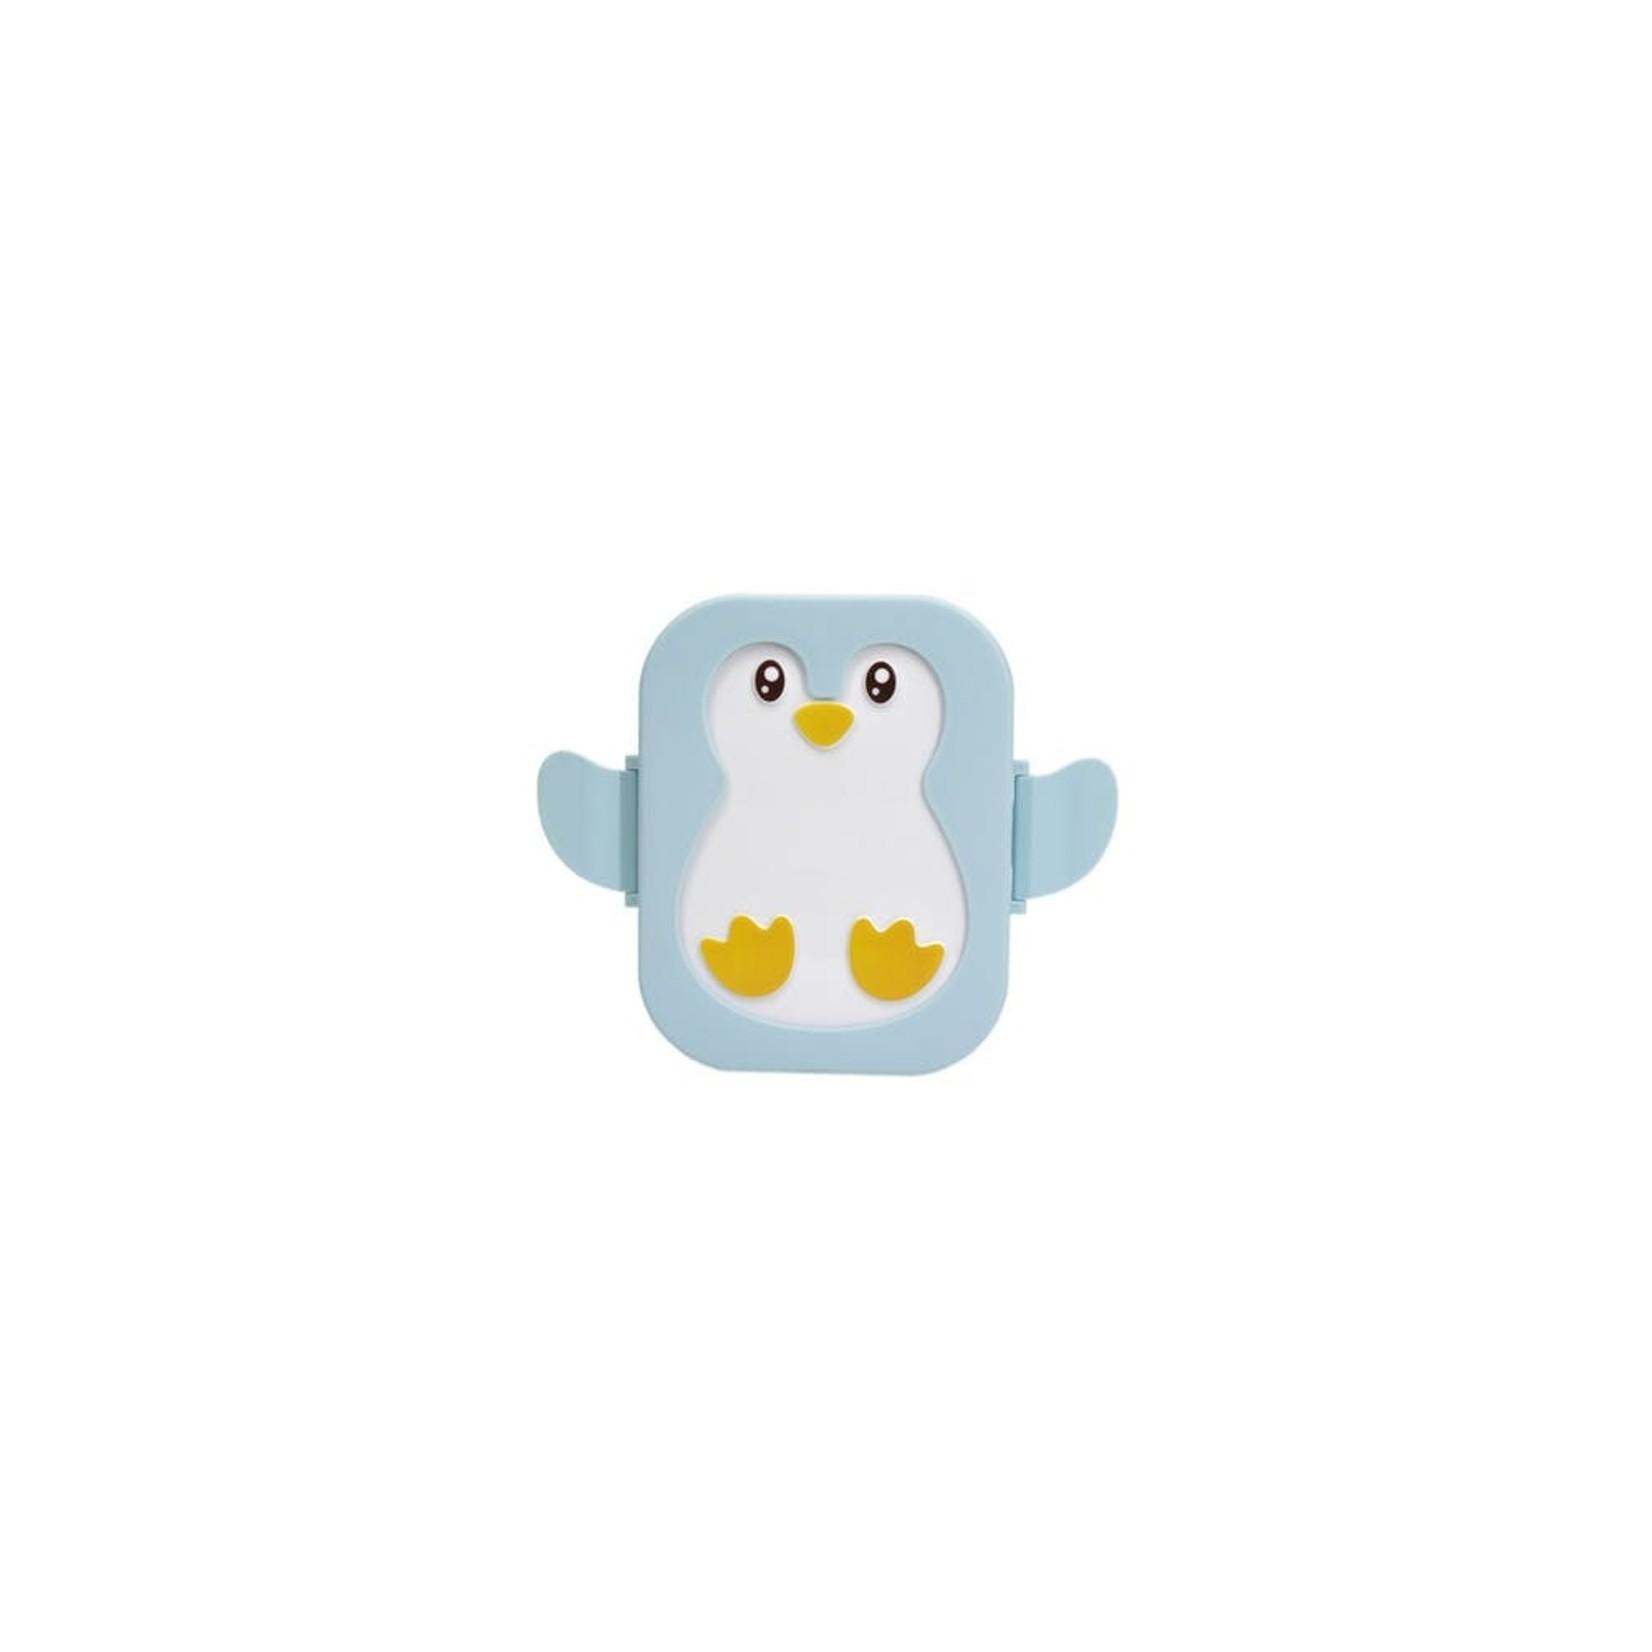 Yuko B Brooddoos Pinguin Blauw